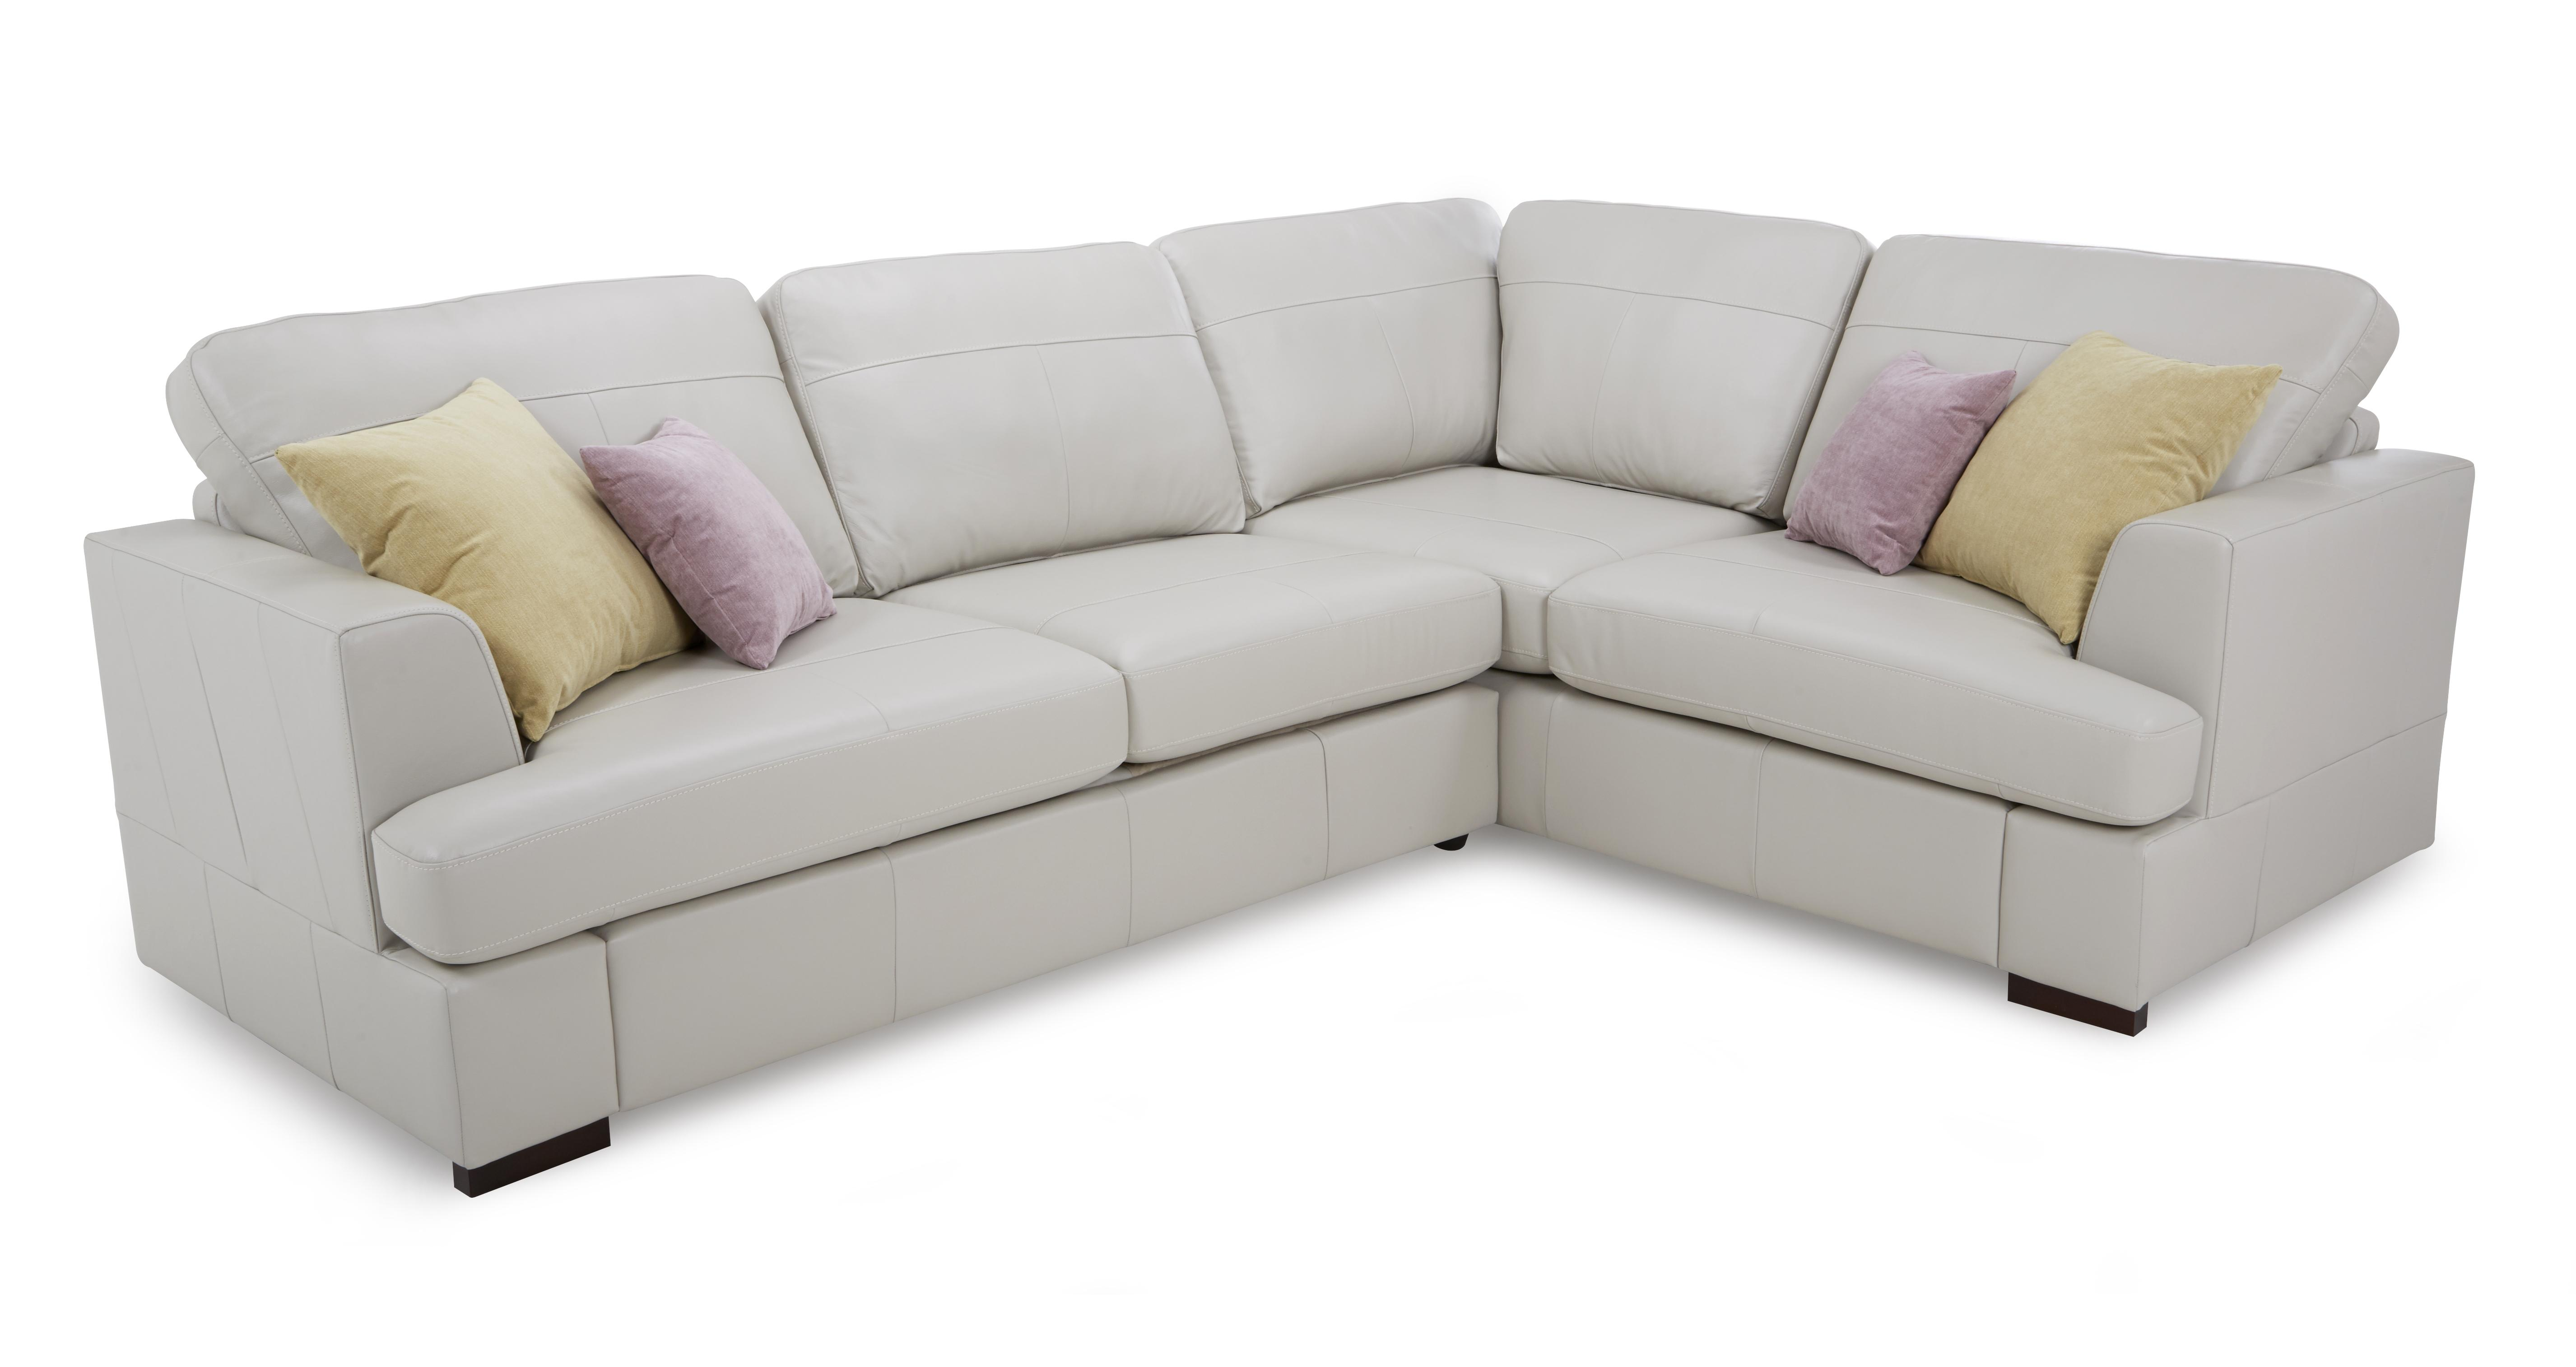 Superb Freya Leather Left Hand Facing 2 Piece Corner Sofa Machost Co Dining Chair Design Ideas Machostcouk